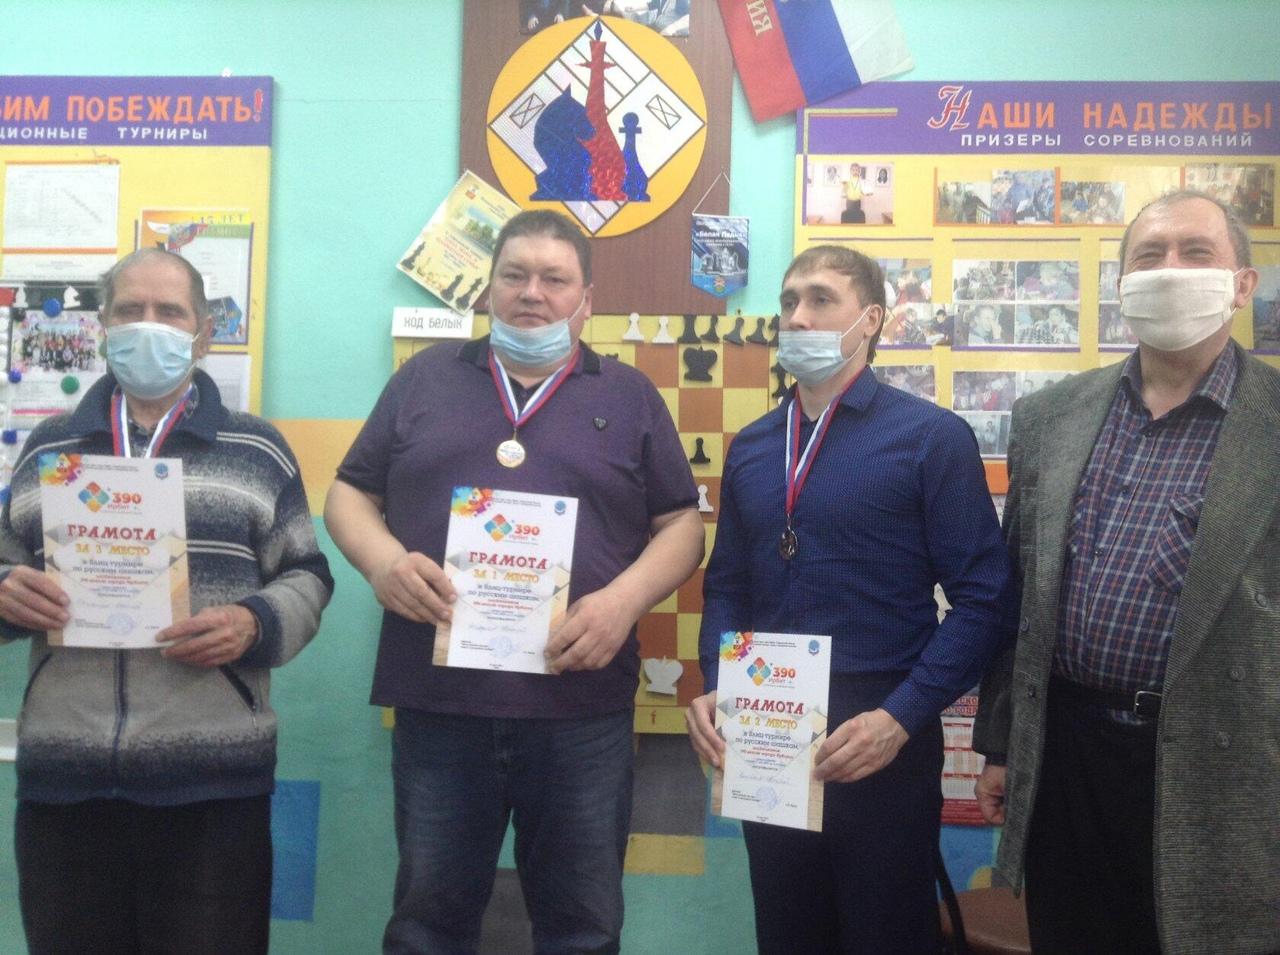 Блиц-турнир по русским шашкам